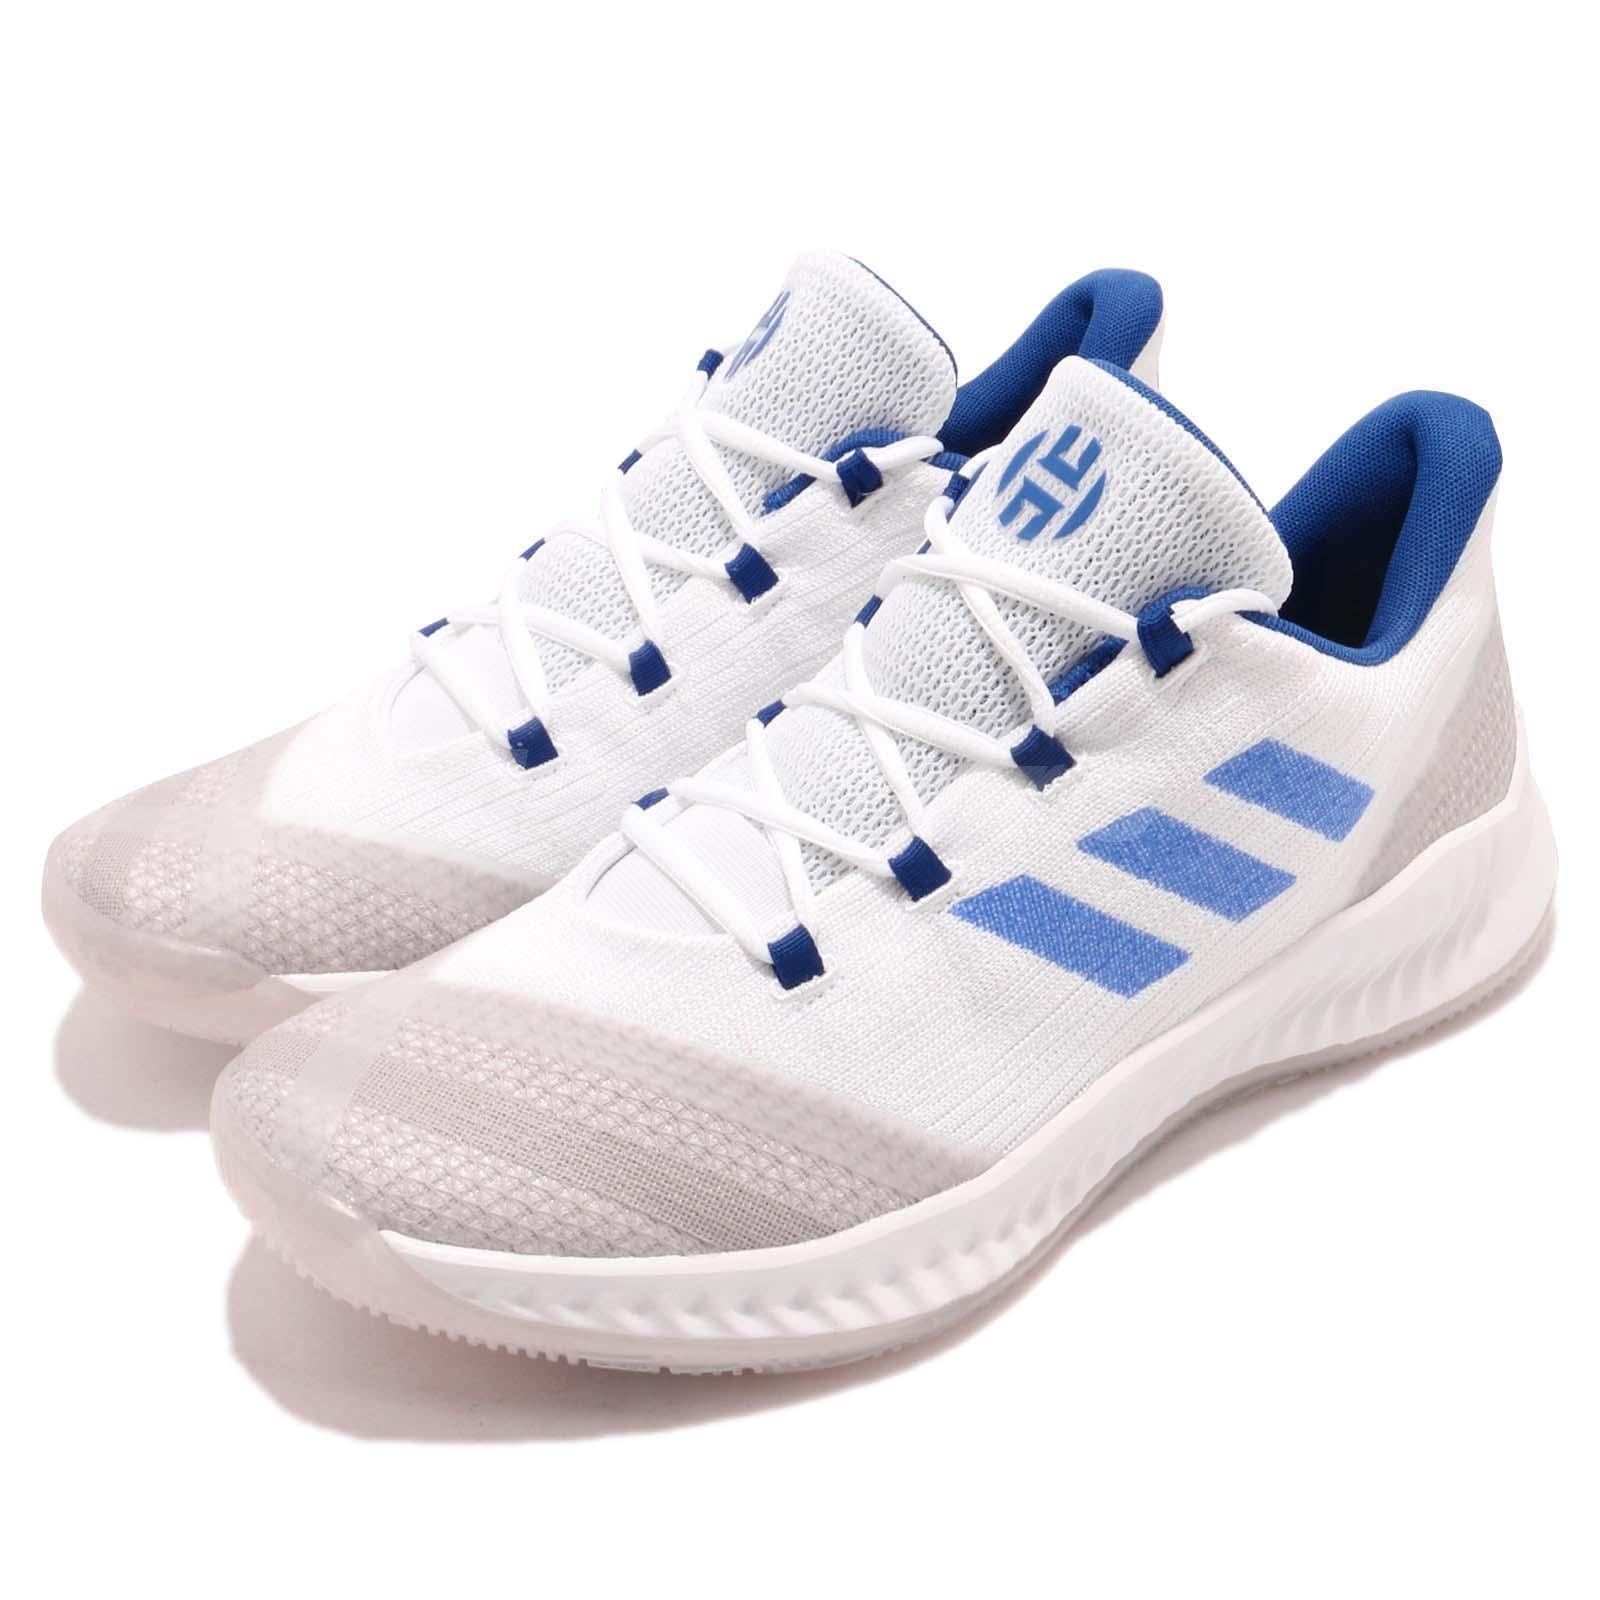 a073f93b38d1 Details about adidas Harden B E 2 II James White Blue Grey Men Basketball  Shoes Sneaker BB7672